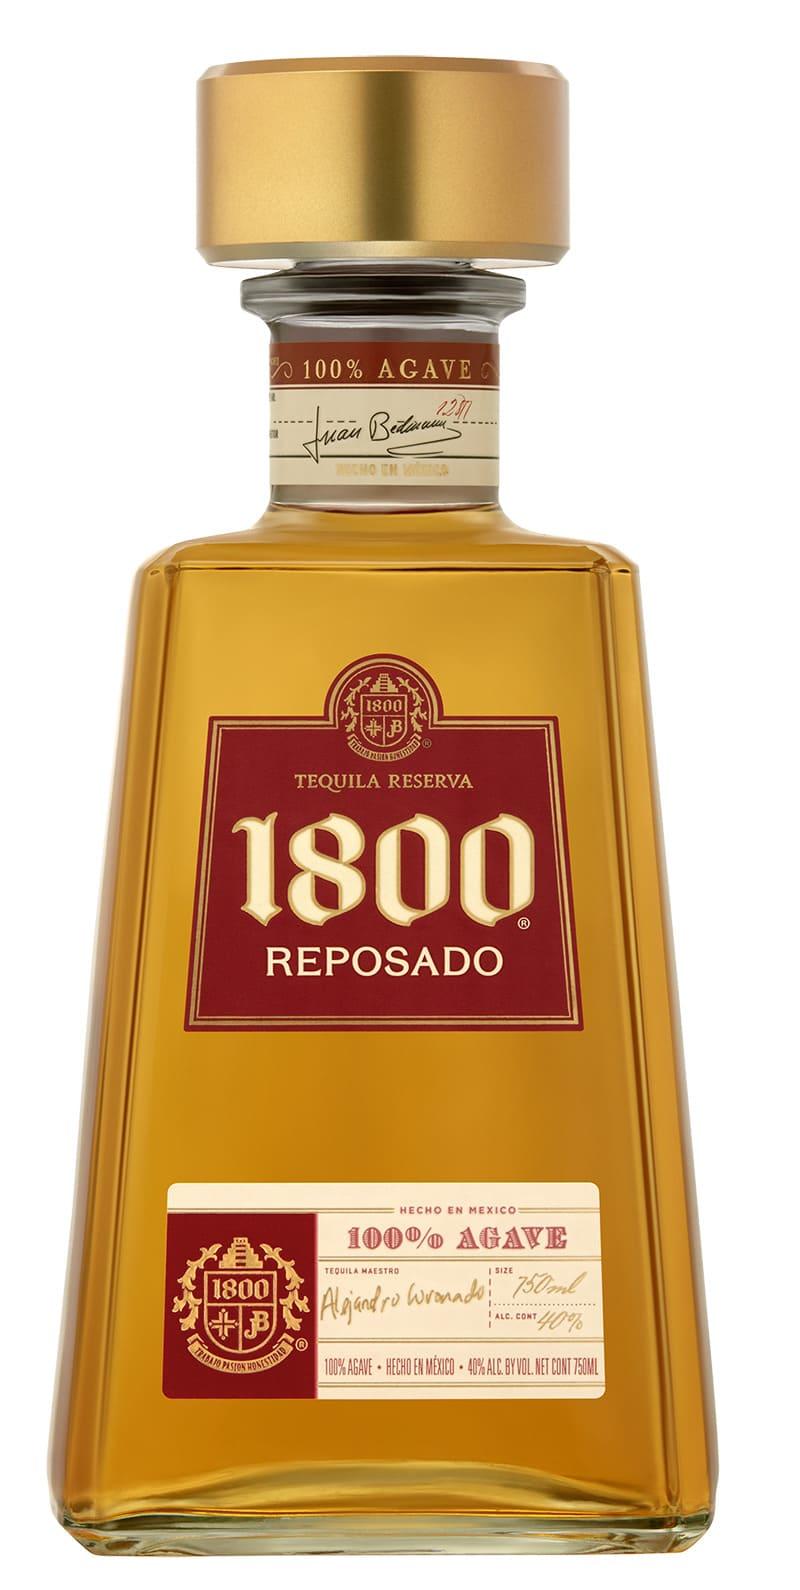 Tequila Reserva 1800 750 Ml Reposado